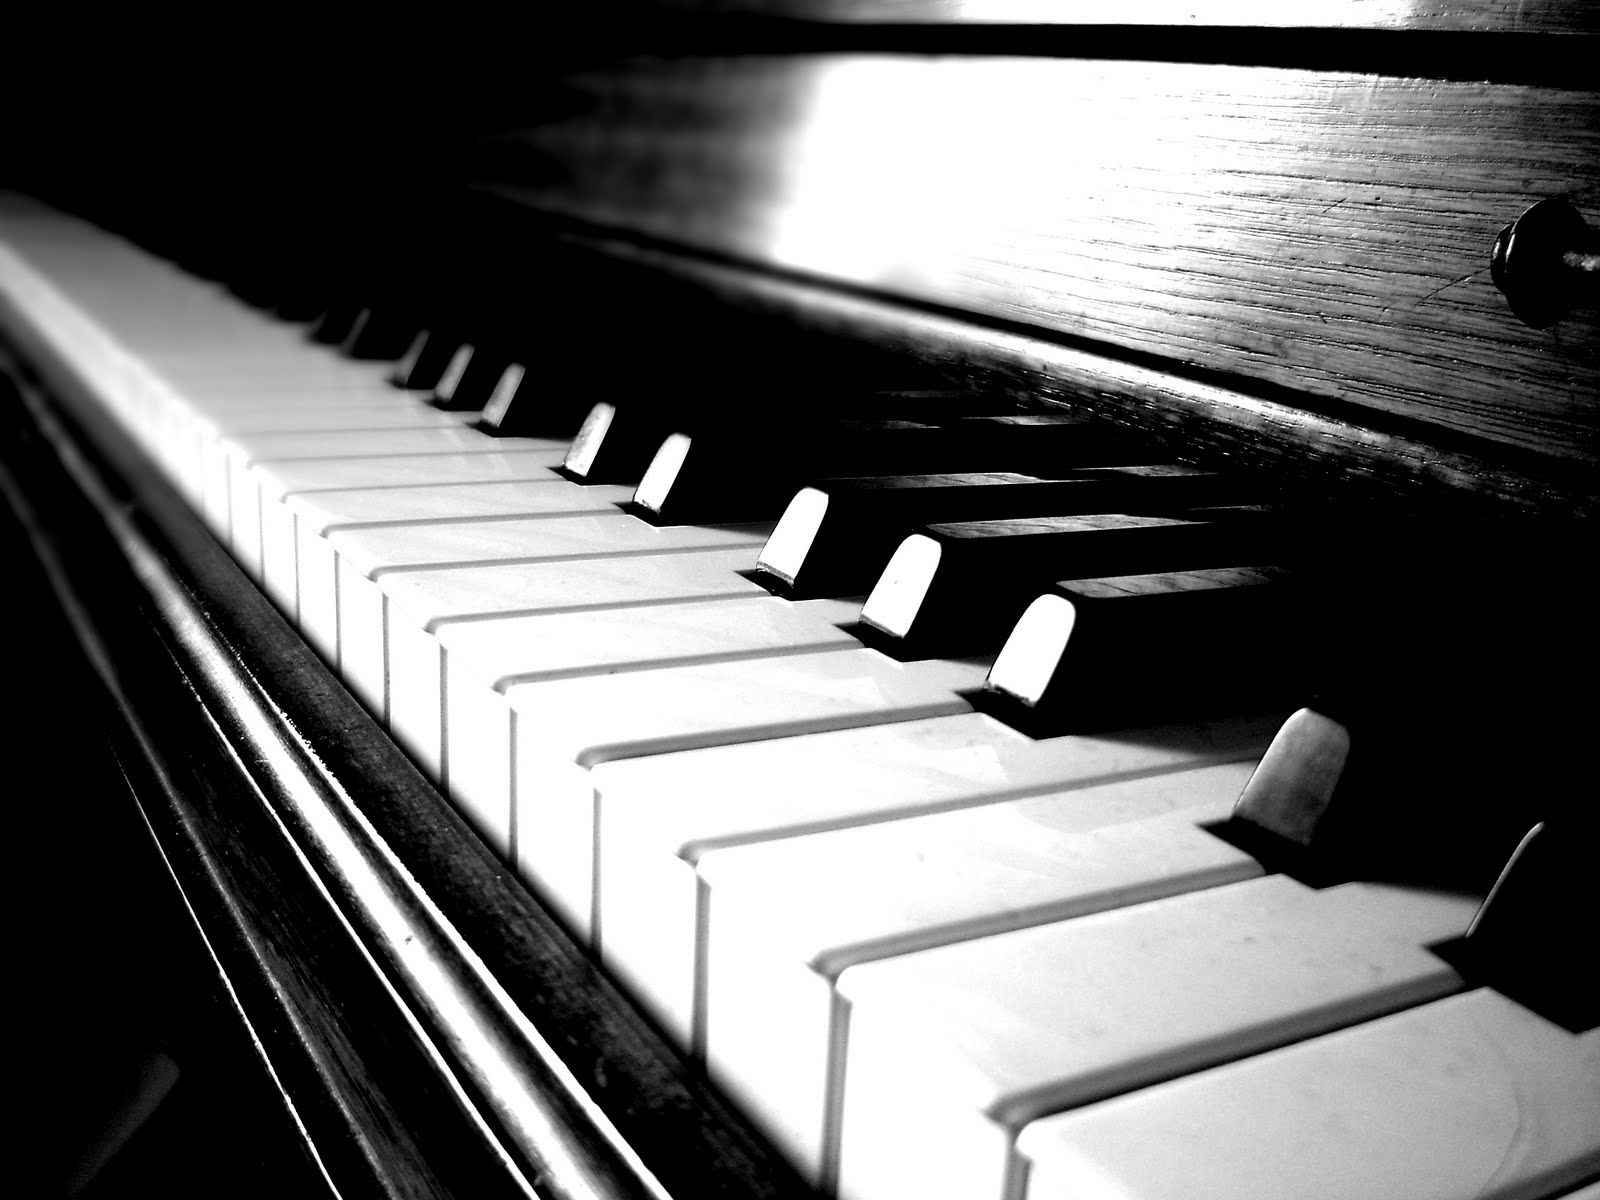 http://static.squarespace.com/static/51d349f6e4b085686832099b/t/51d3a4b7e4b0290bcc57260a/1372824759515/piano-s.jpg